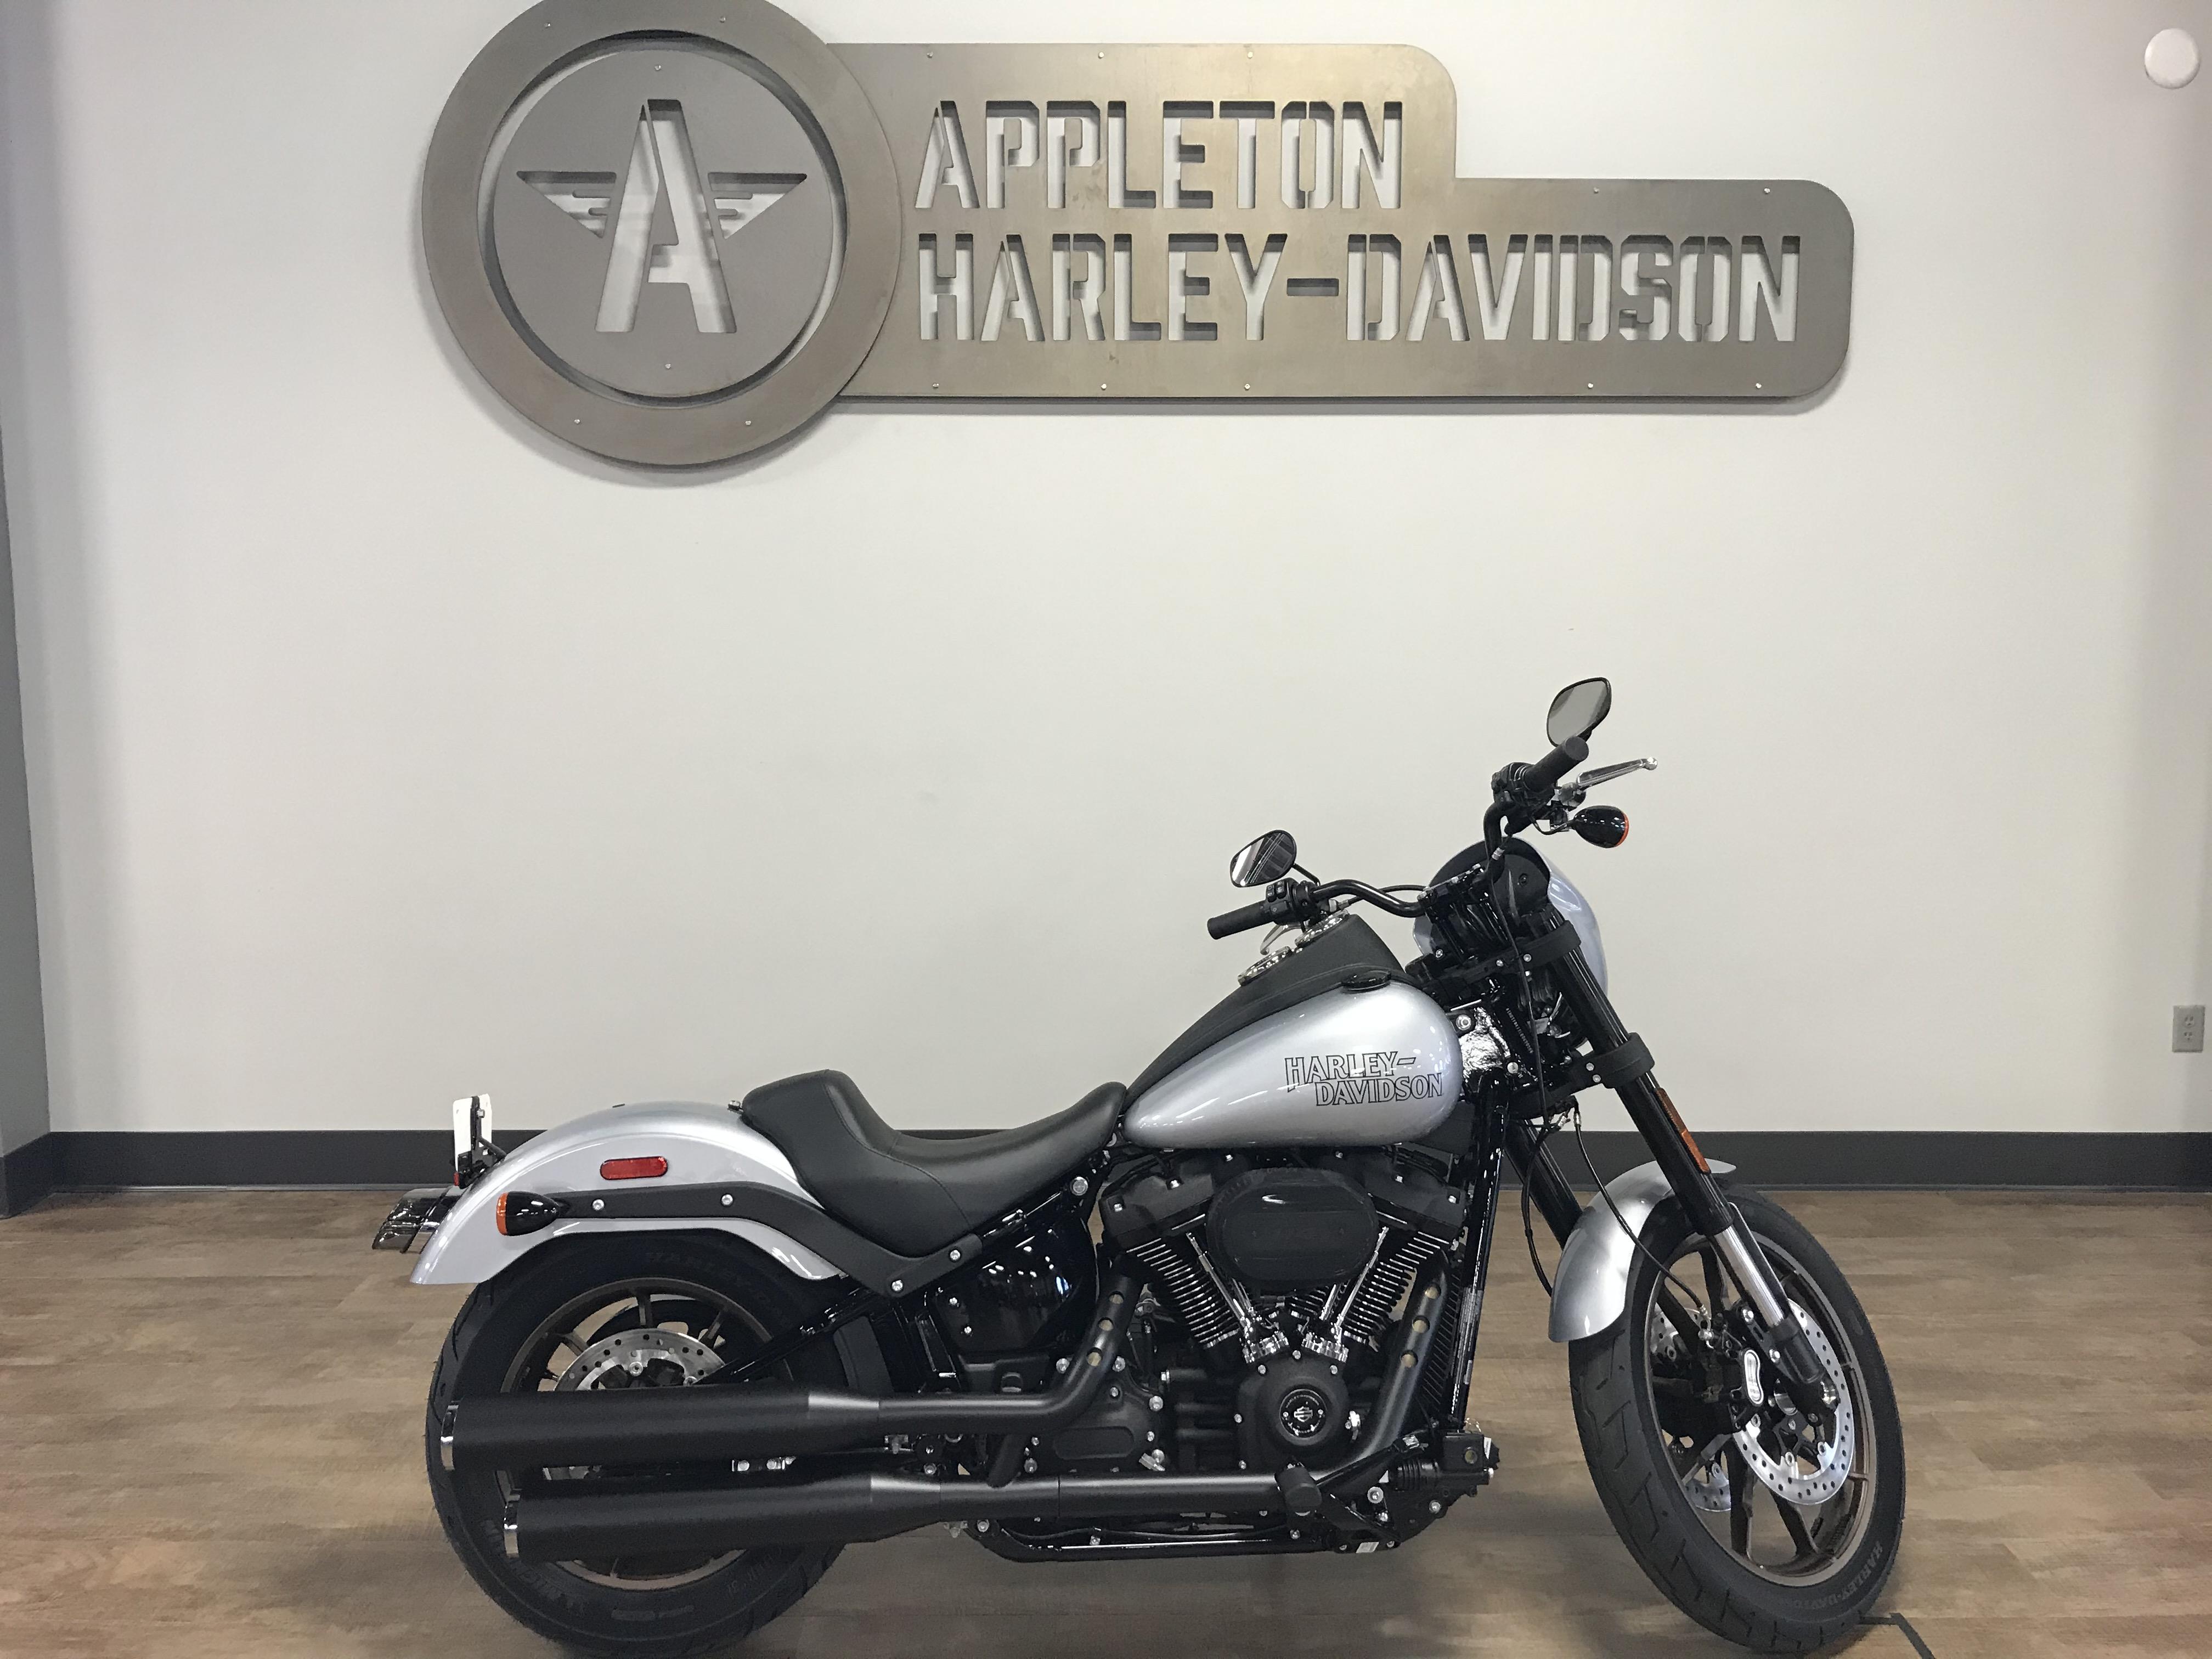 2020 Harley-Davidson Lowrider S [8]